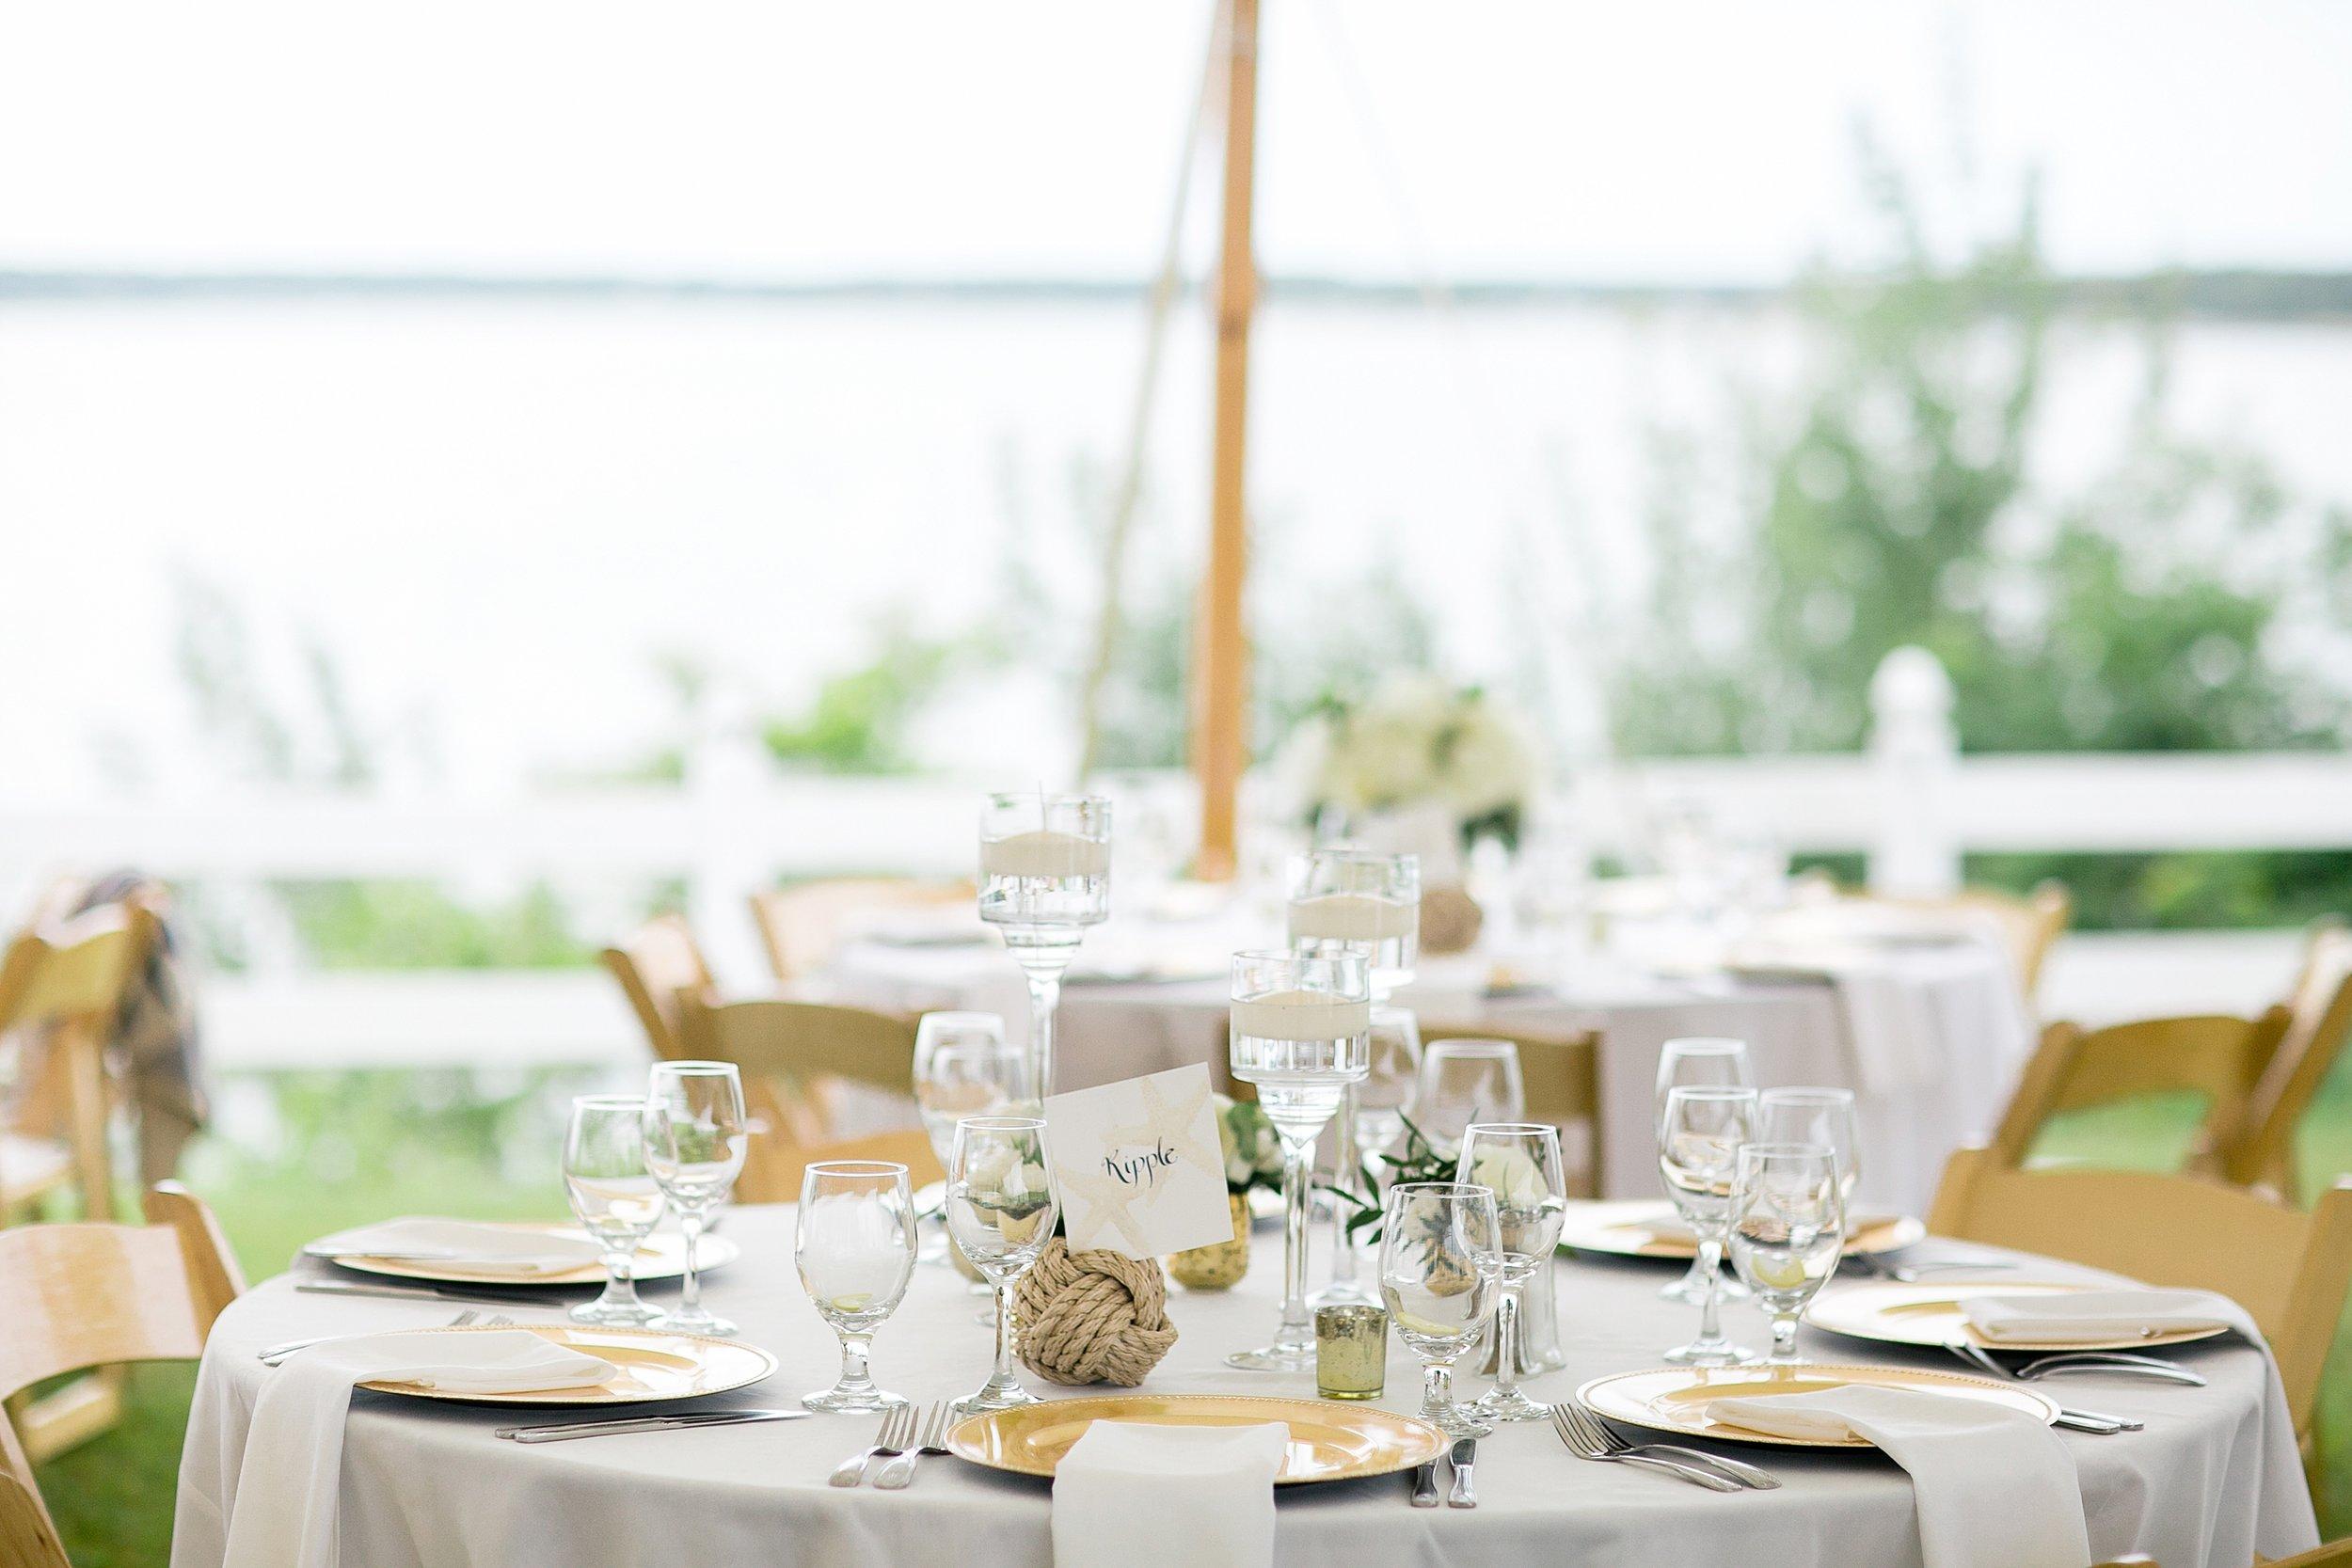 044 los angeles wedding photographer todd danforth photography cape cod.jpg